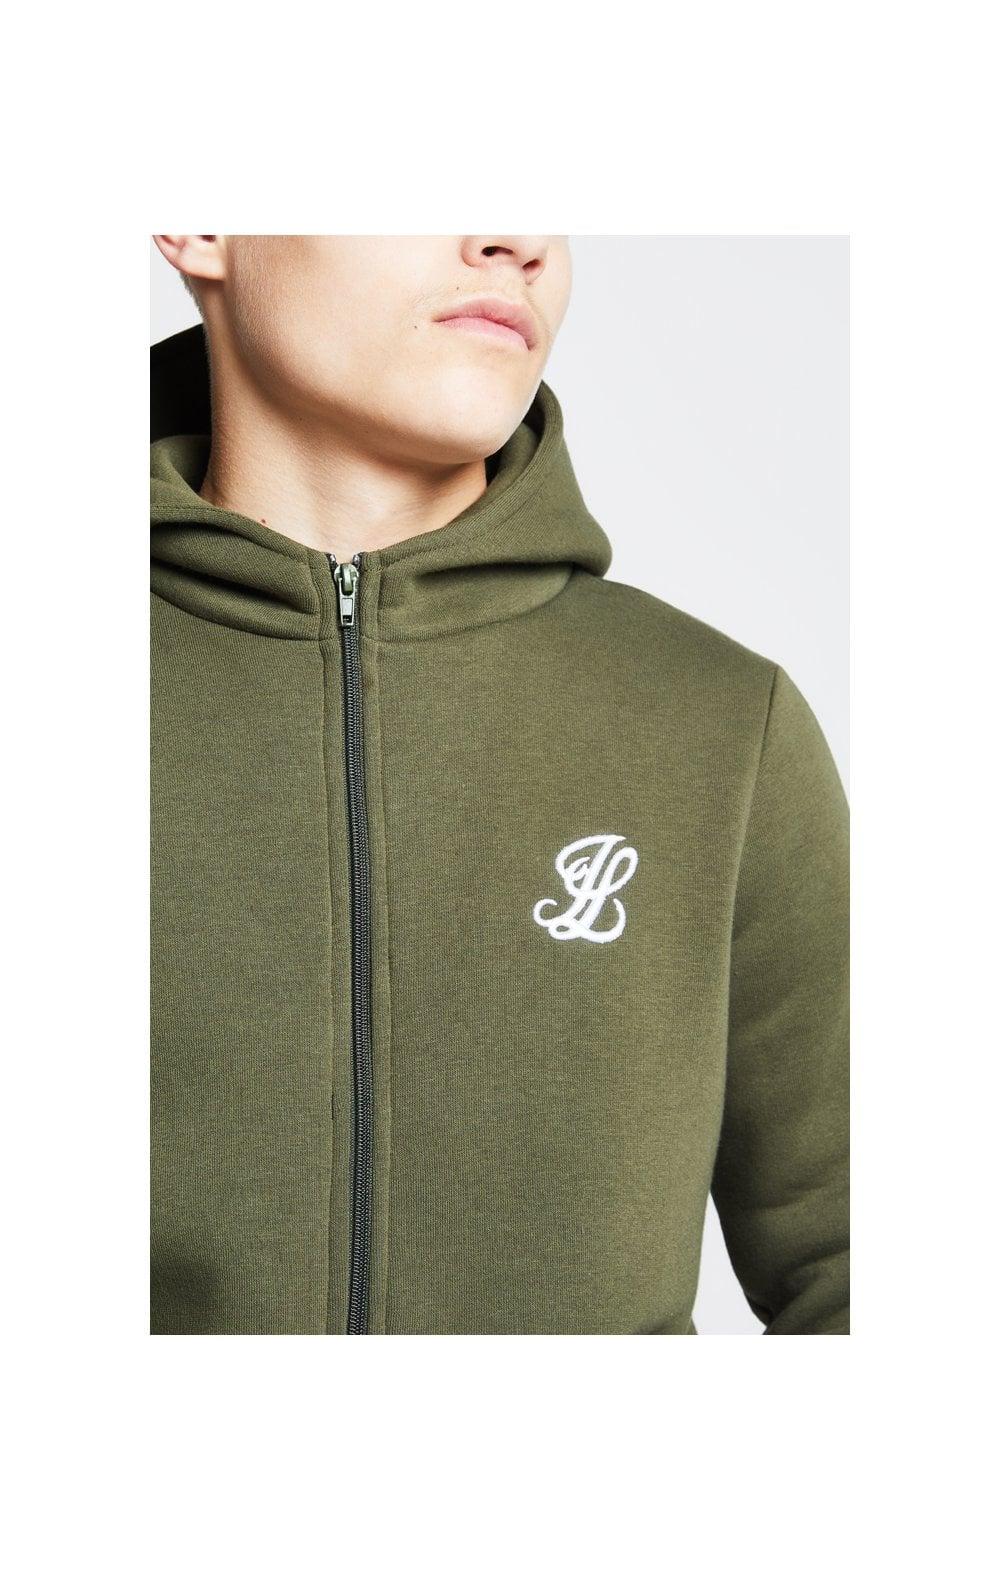 Illusive London Zip Through Hoodie - Khaki Kids Top Sizes: 15 YRS